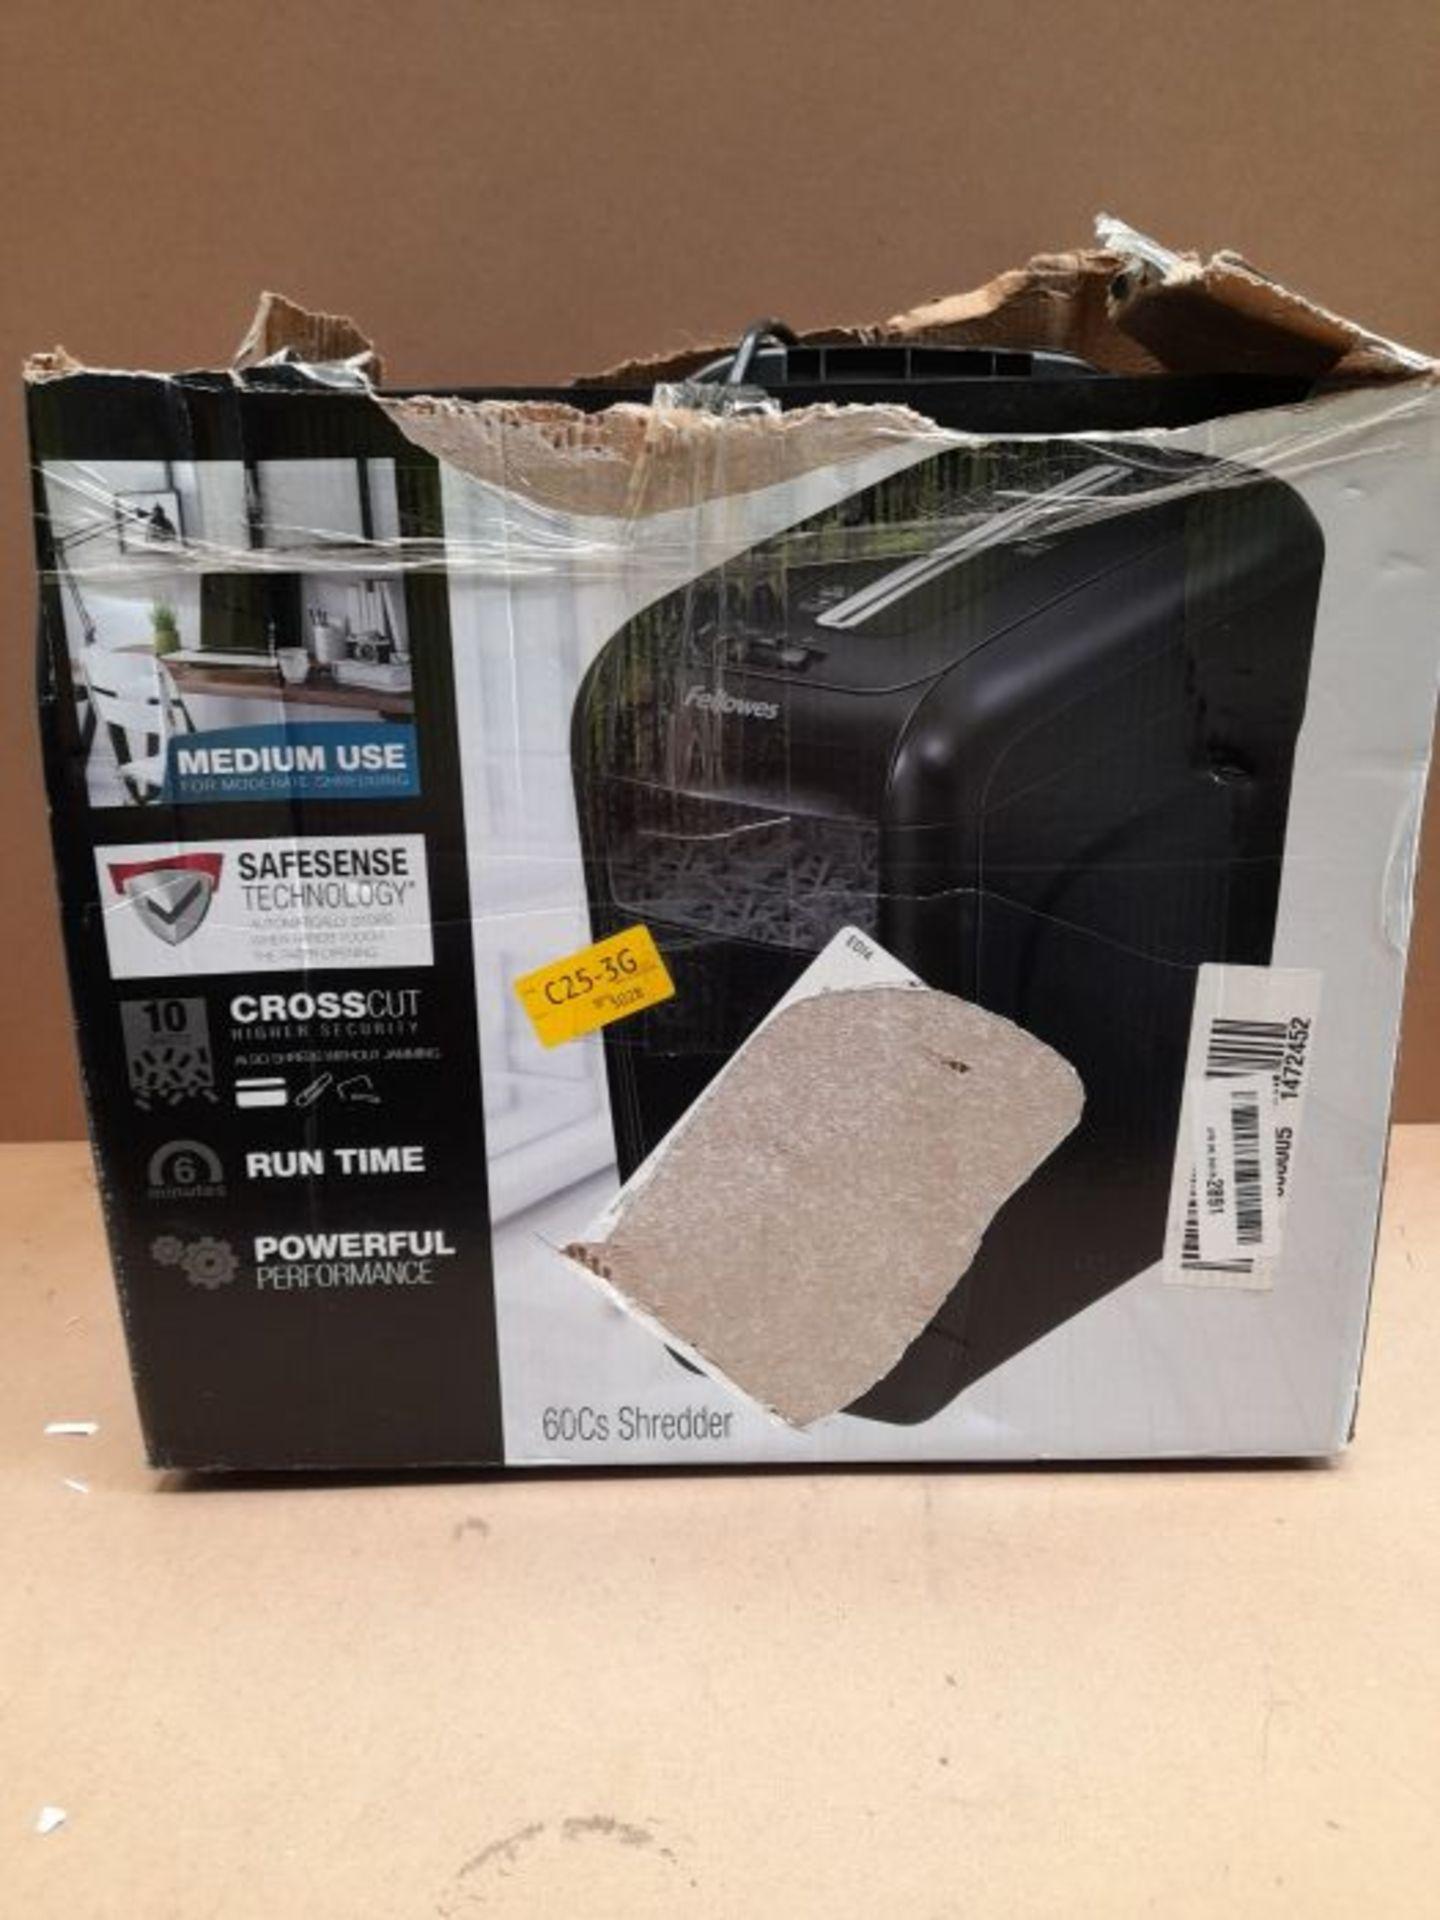 RRP £51.00 Fellowes Powershred 60Cs, 10 Sheet Cross Cut Paper Shredder for the Home or Home Offic - Image 2 of 3